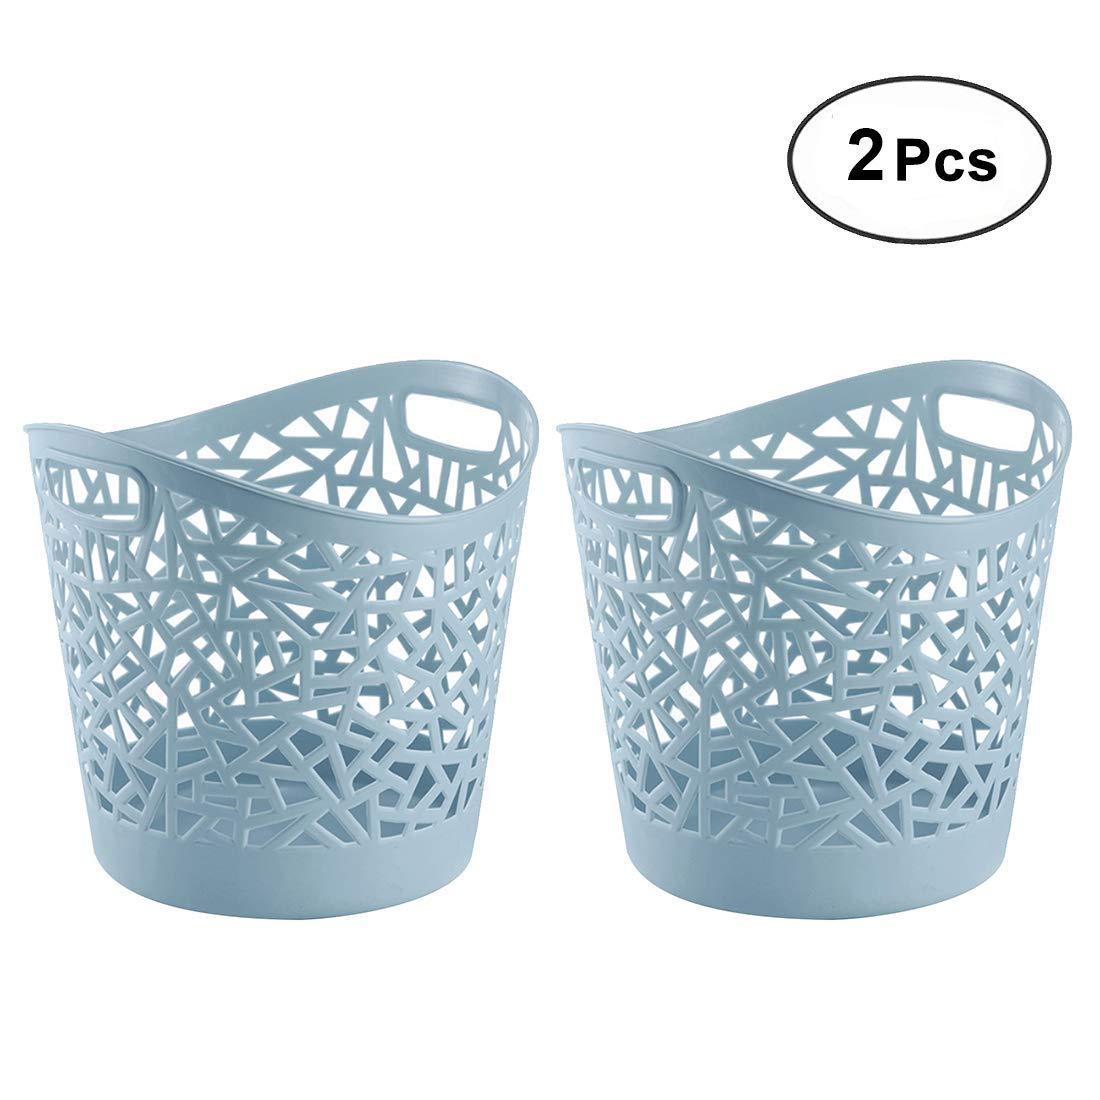 Peleustech ® 2pcs簡単に使用下部Thickeningプラスチック中空ランドリーバスケット家庭用ストレージ服バスケット – (ブルー) B07FJYFTLG